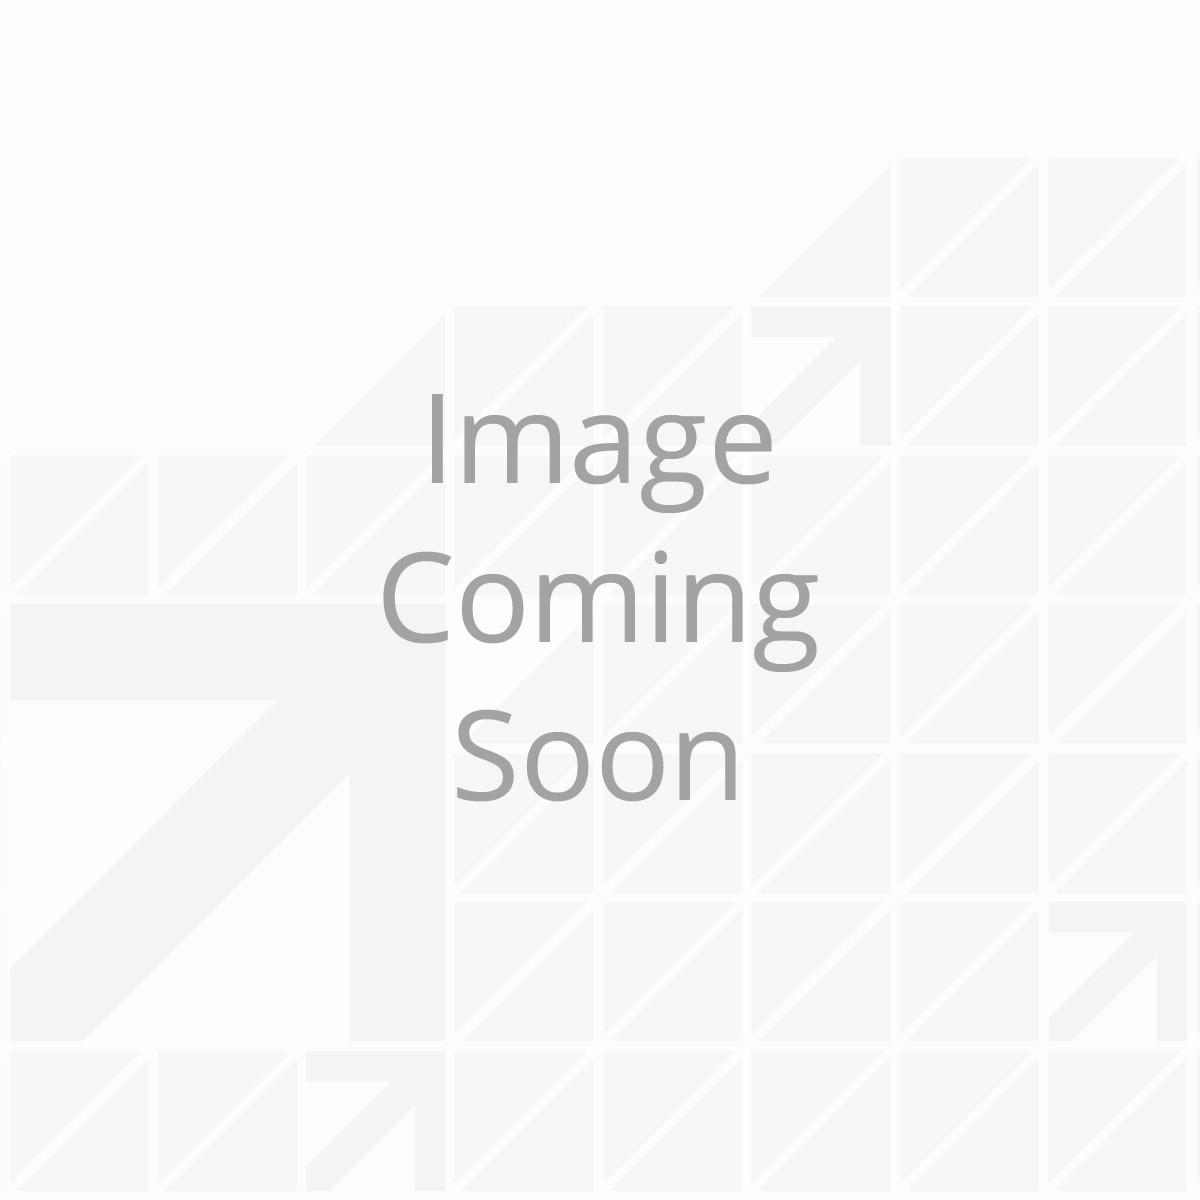 RV Lock Keyless Entry Handle with Keypad - White